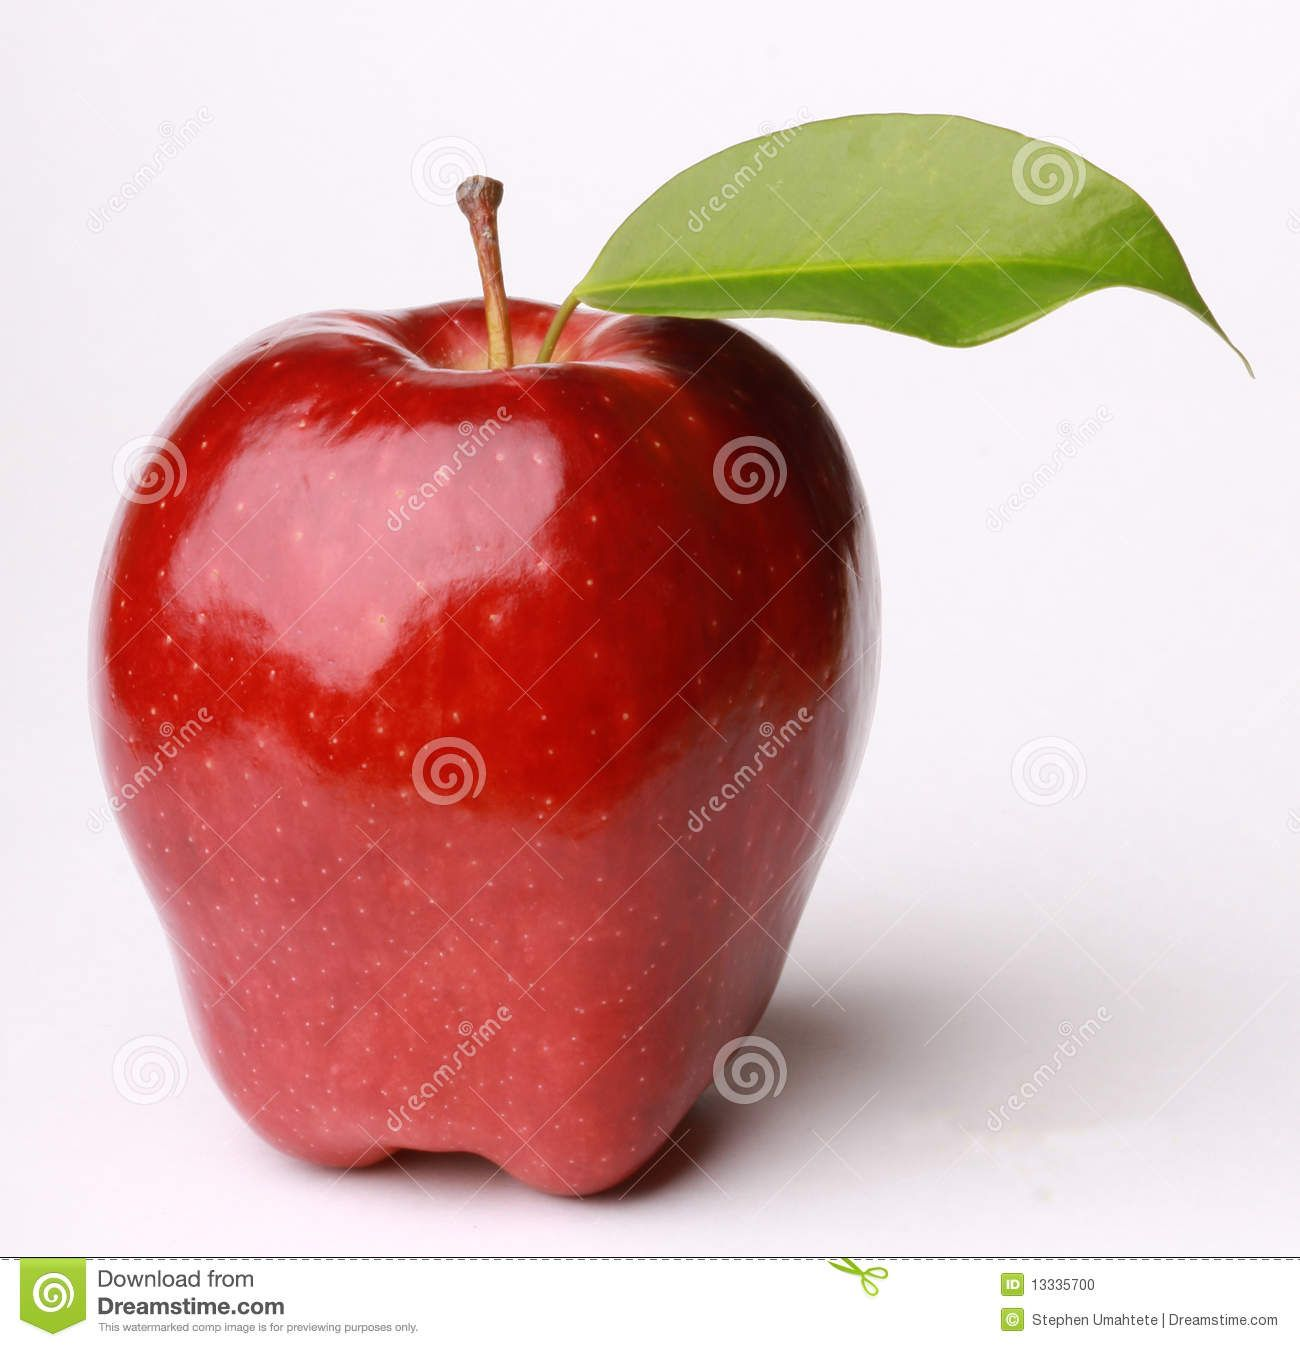 apple fruit image - Google Search | Apple fruit images, Fruit ...